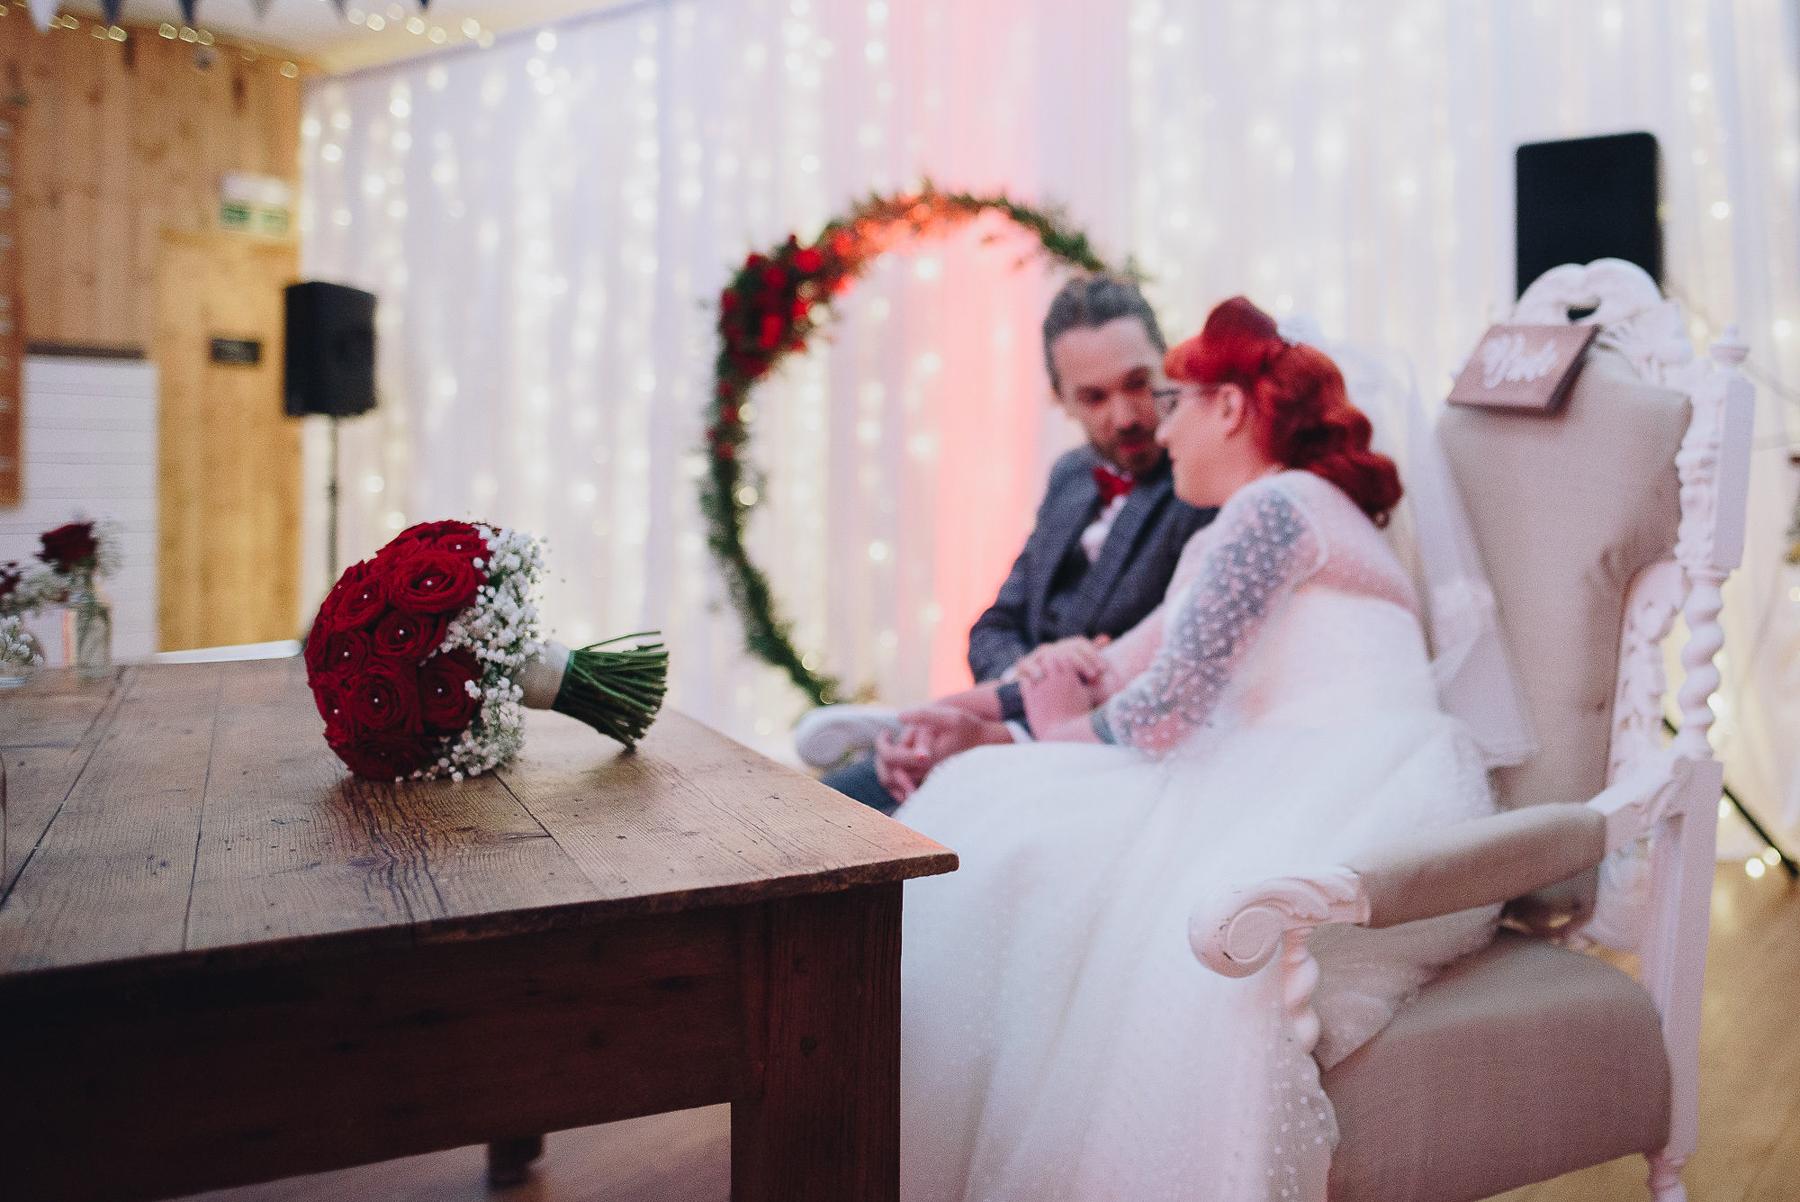 Wellbeing_Farm_Wedding_Photography_The_Pin-Up_Bride_Lara_Shaun-60.jpg